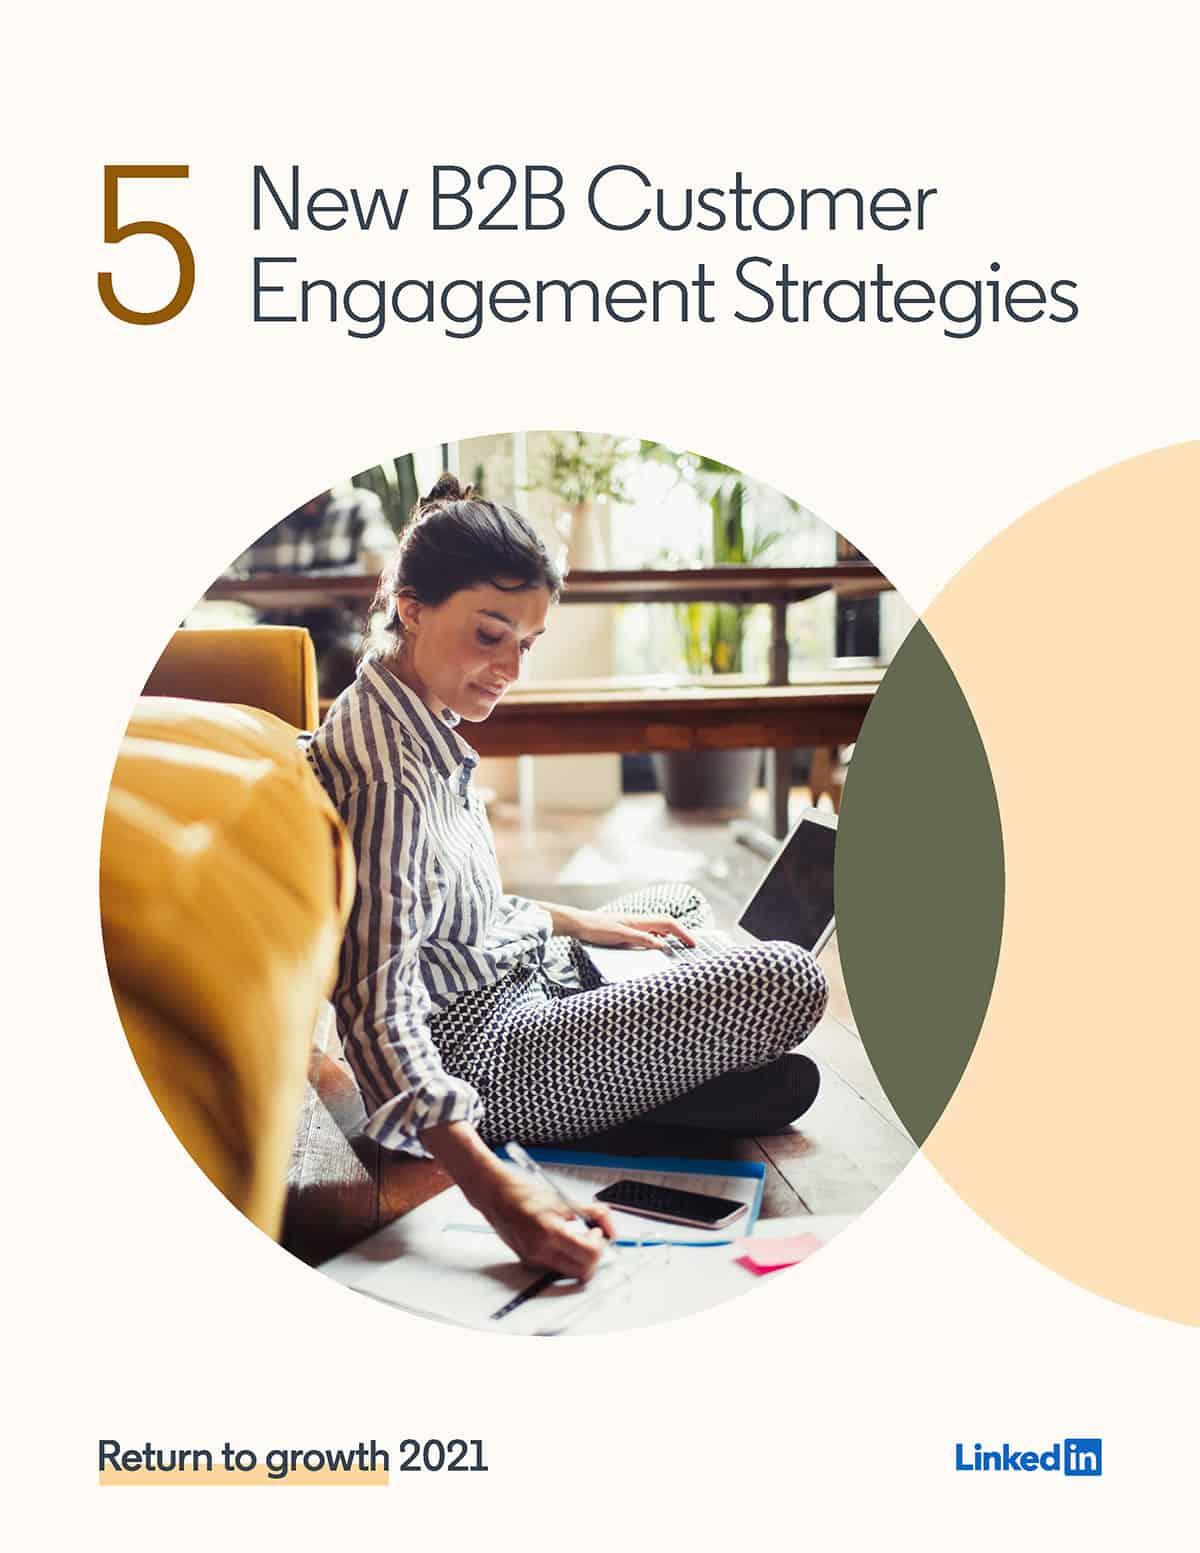 b2b-kundenbindungsstrategien-linkedin-01-iservice